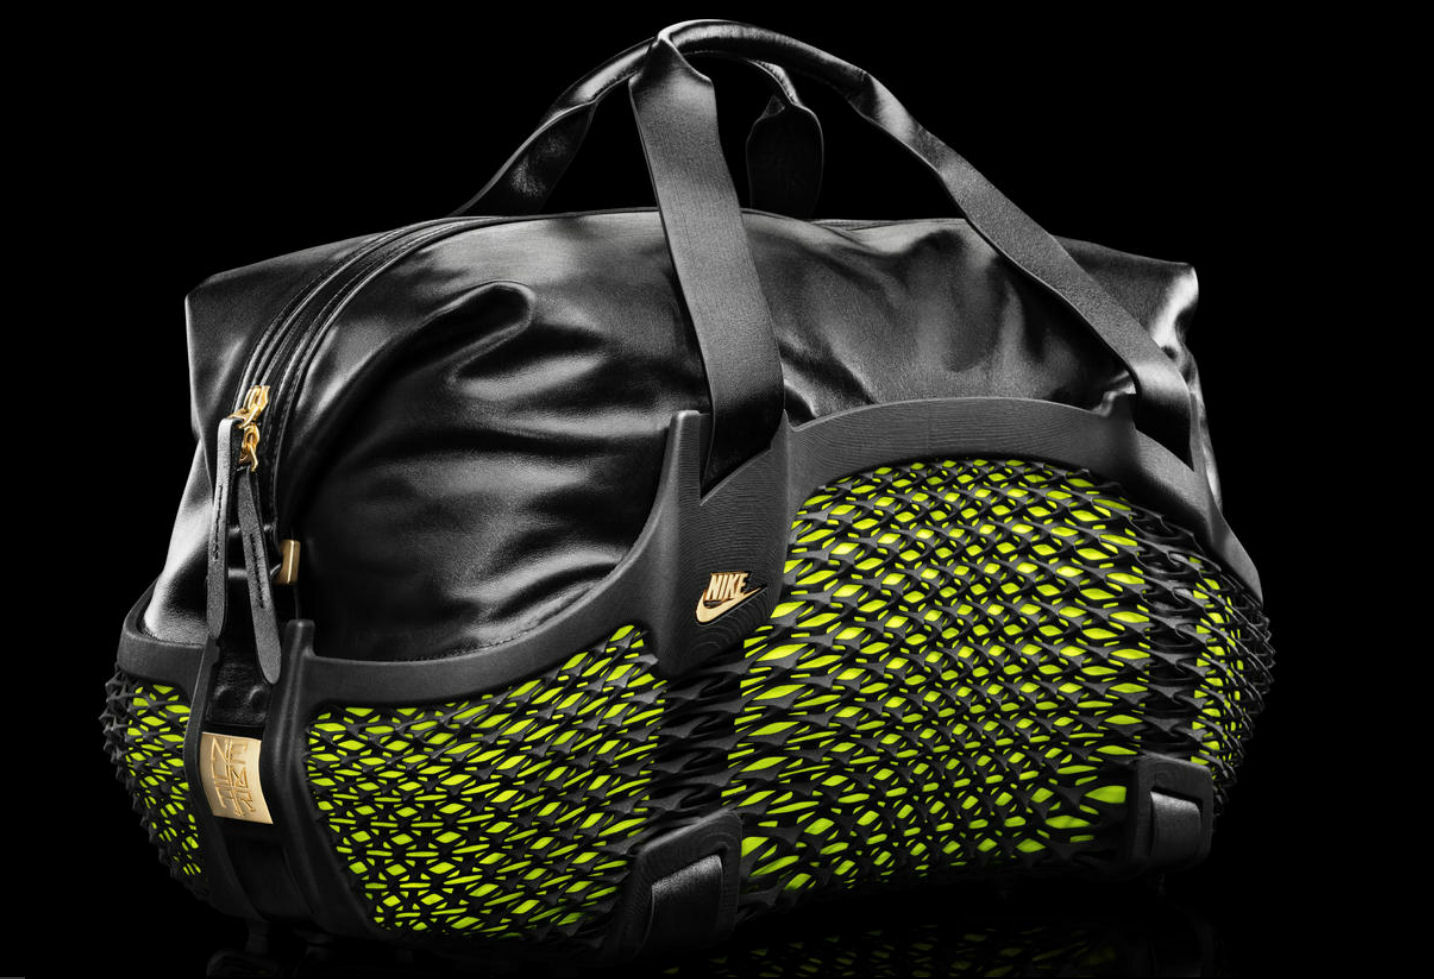 3D printed sports bag